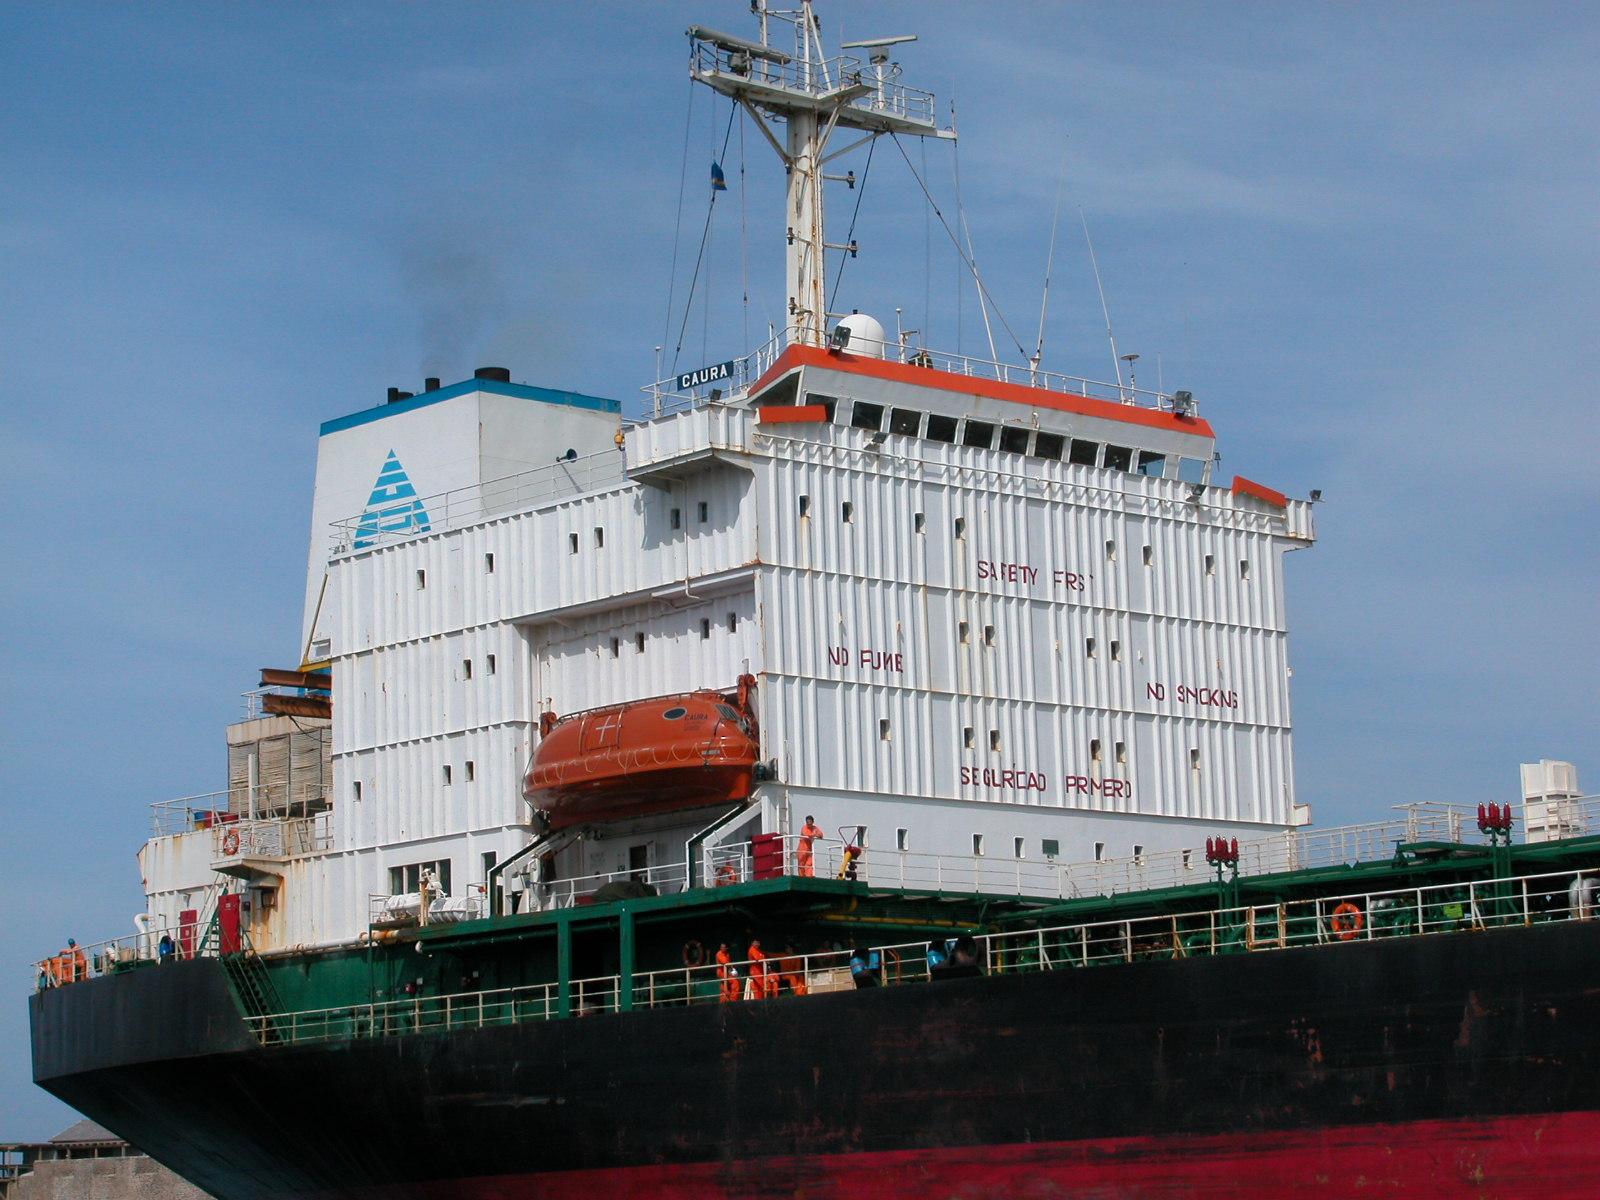 jacco ship freight freighter huge big naval no skoming white black